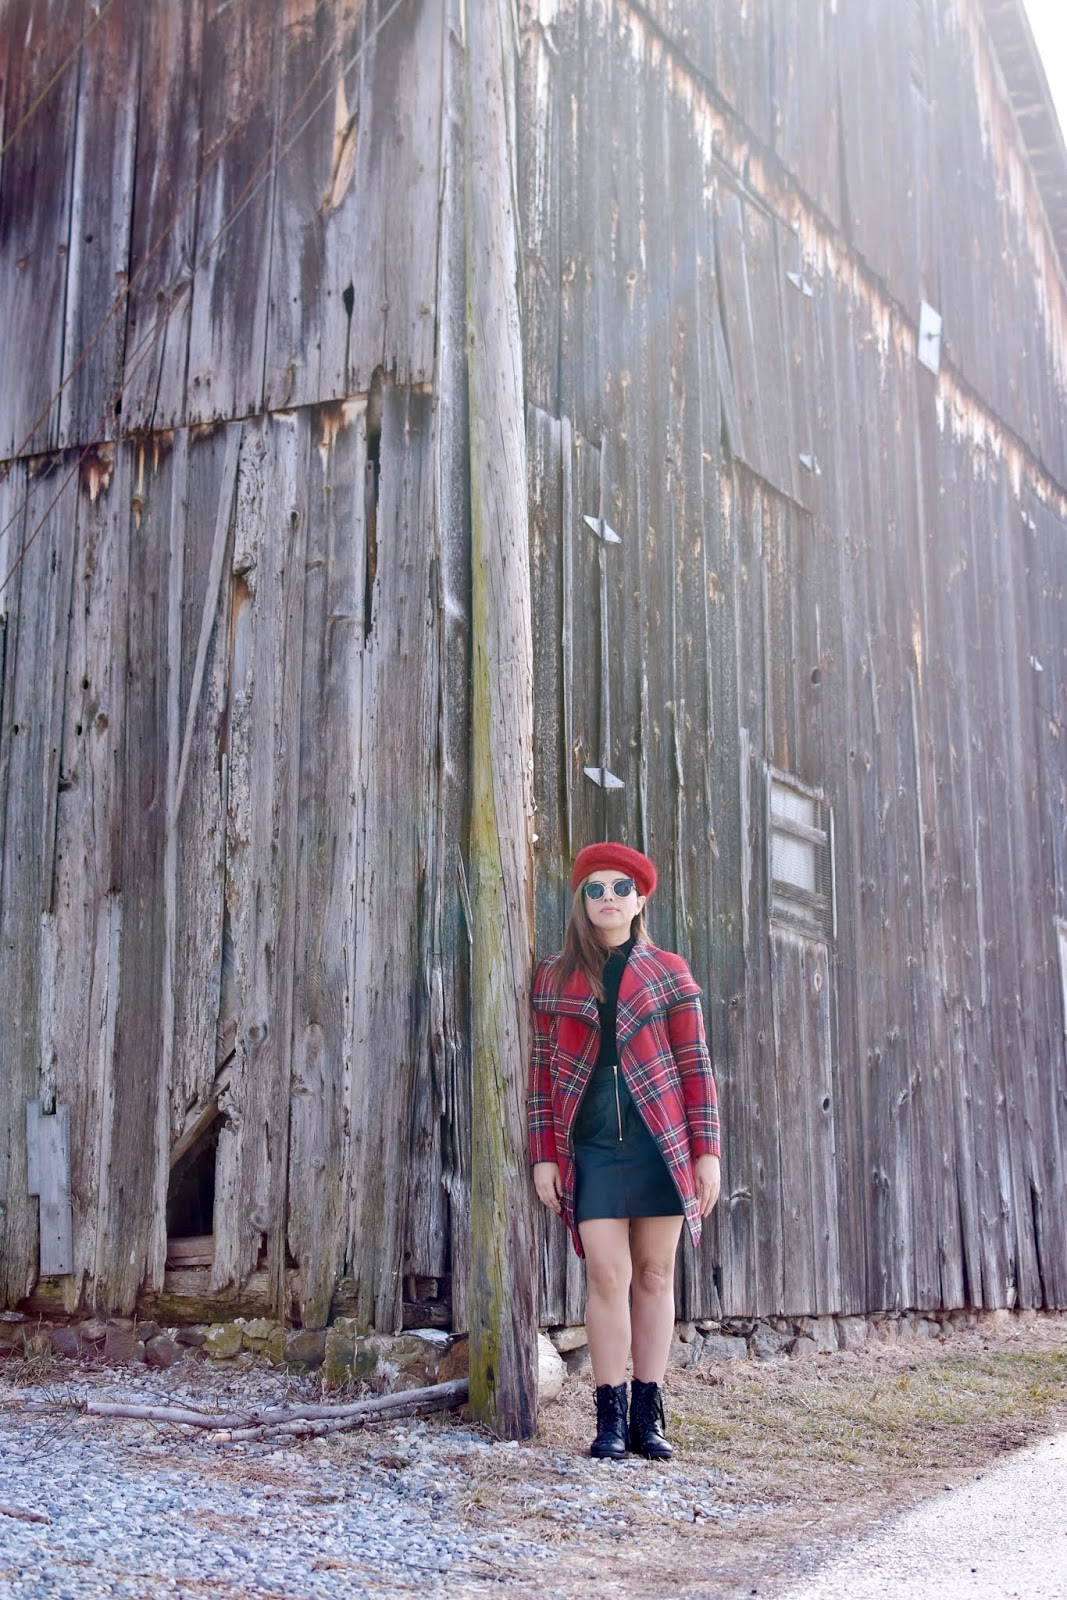 Plaid Waterfall Outerwear by Mari Estilo-sheIn-Fashionblogger-modaelsalvador-dcblogger-